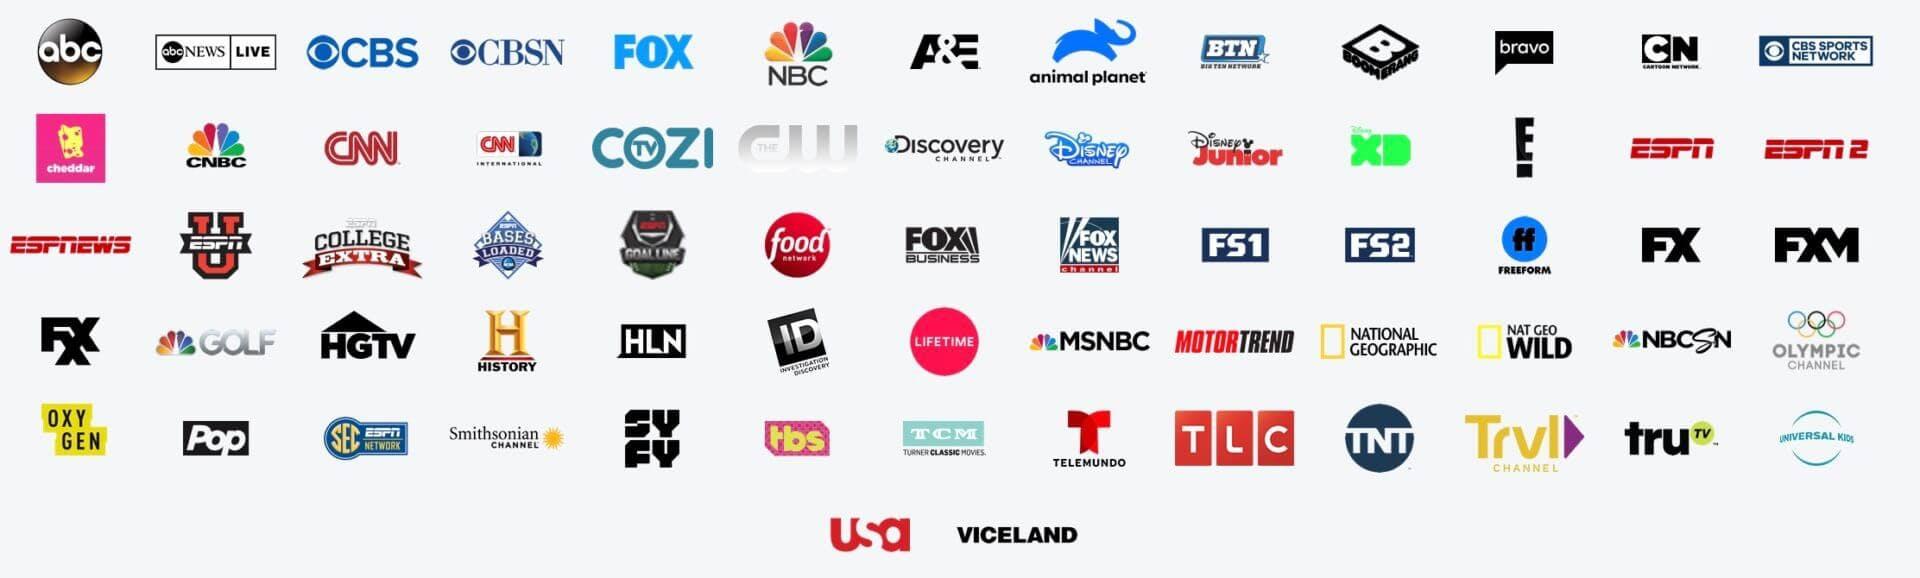 watch 2019 Emmy awards on hulu with live TV